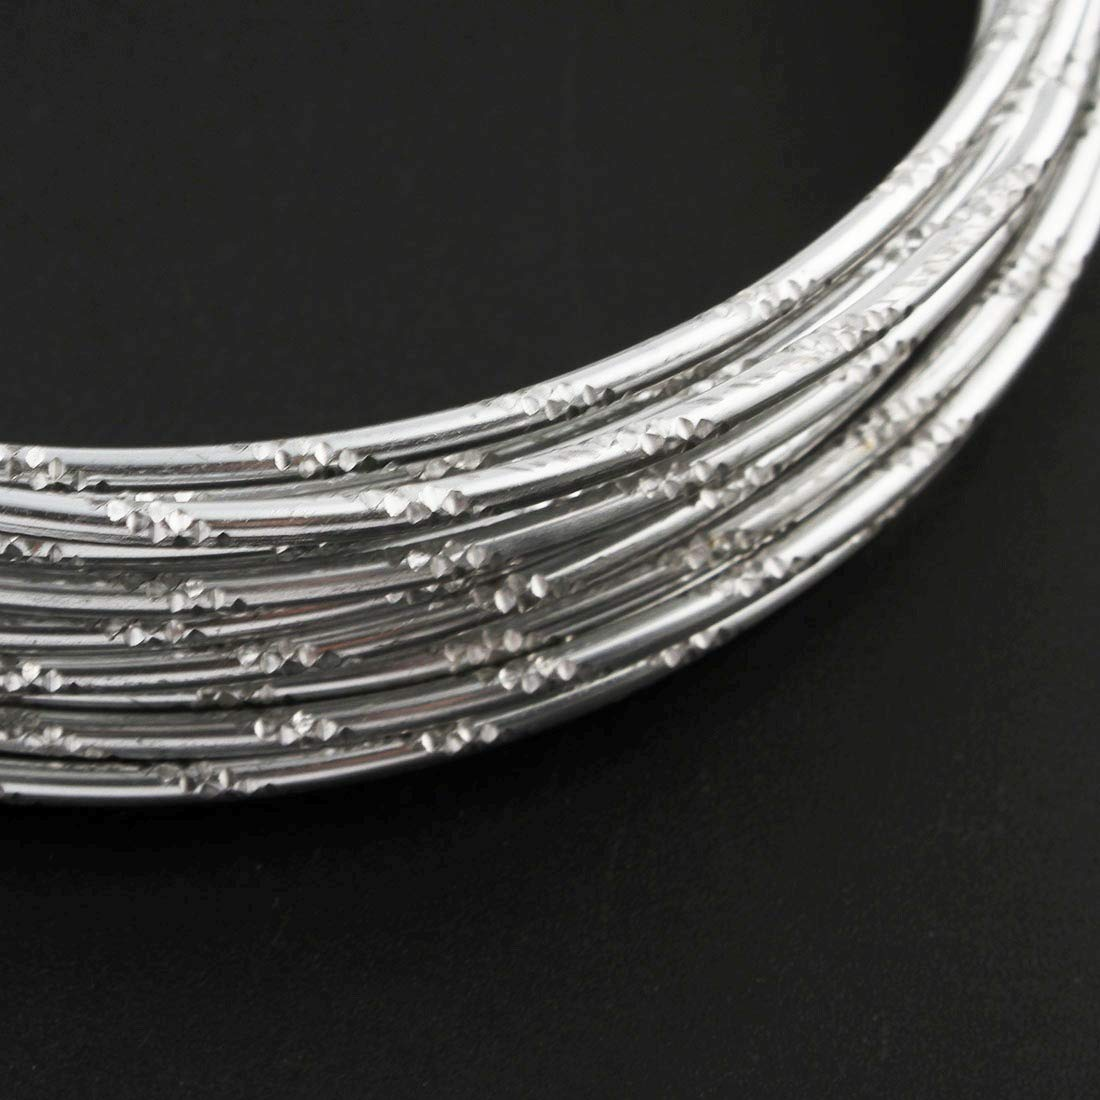 Lackdraht Schmuckdraht Perlendraht Meterware C78 x5 Aludraht 2mm Aluminiumdraht Silberfarbe Diamant Effekt 25 Meter